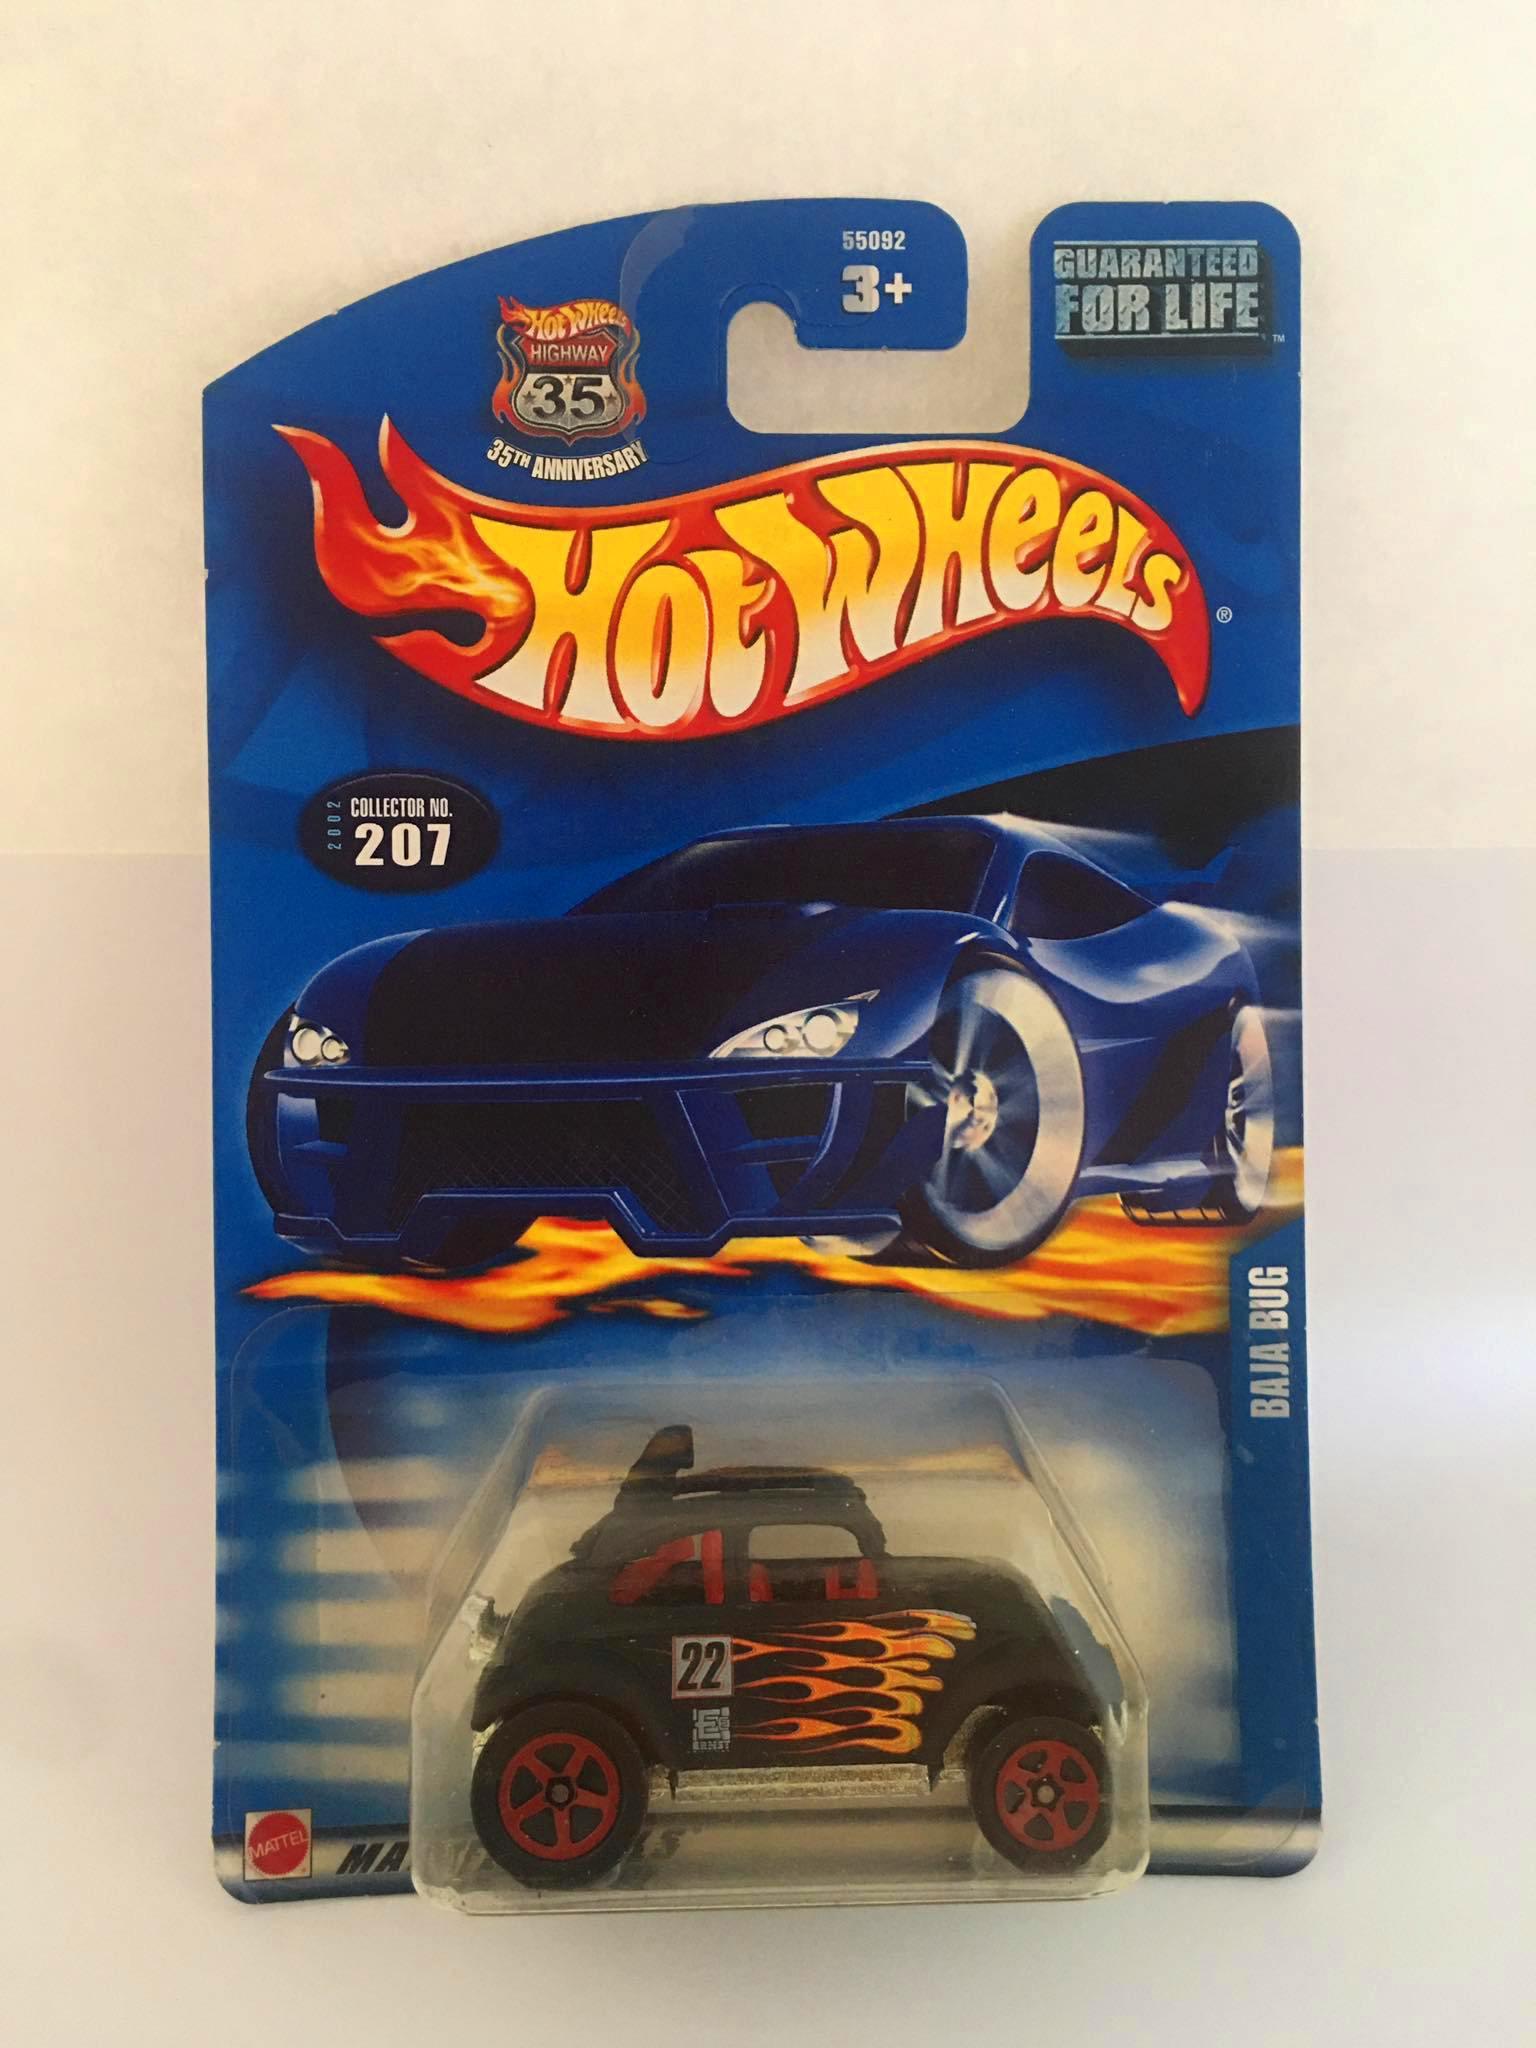 Hot Wheels - Baja Bug Preto Cartela For Life - Mainline 2003